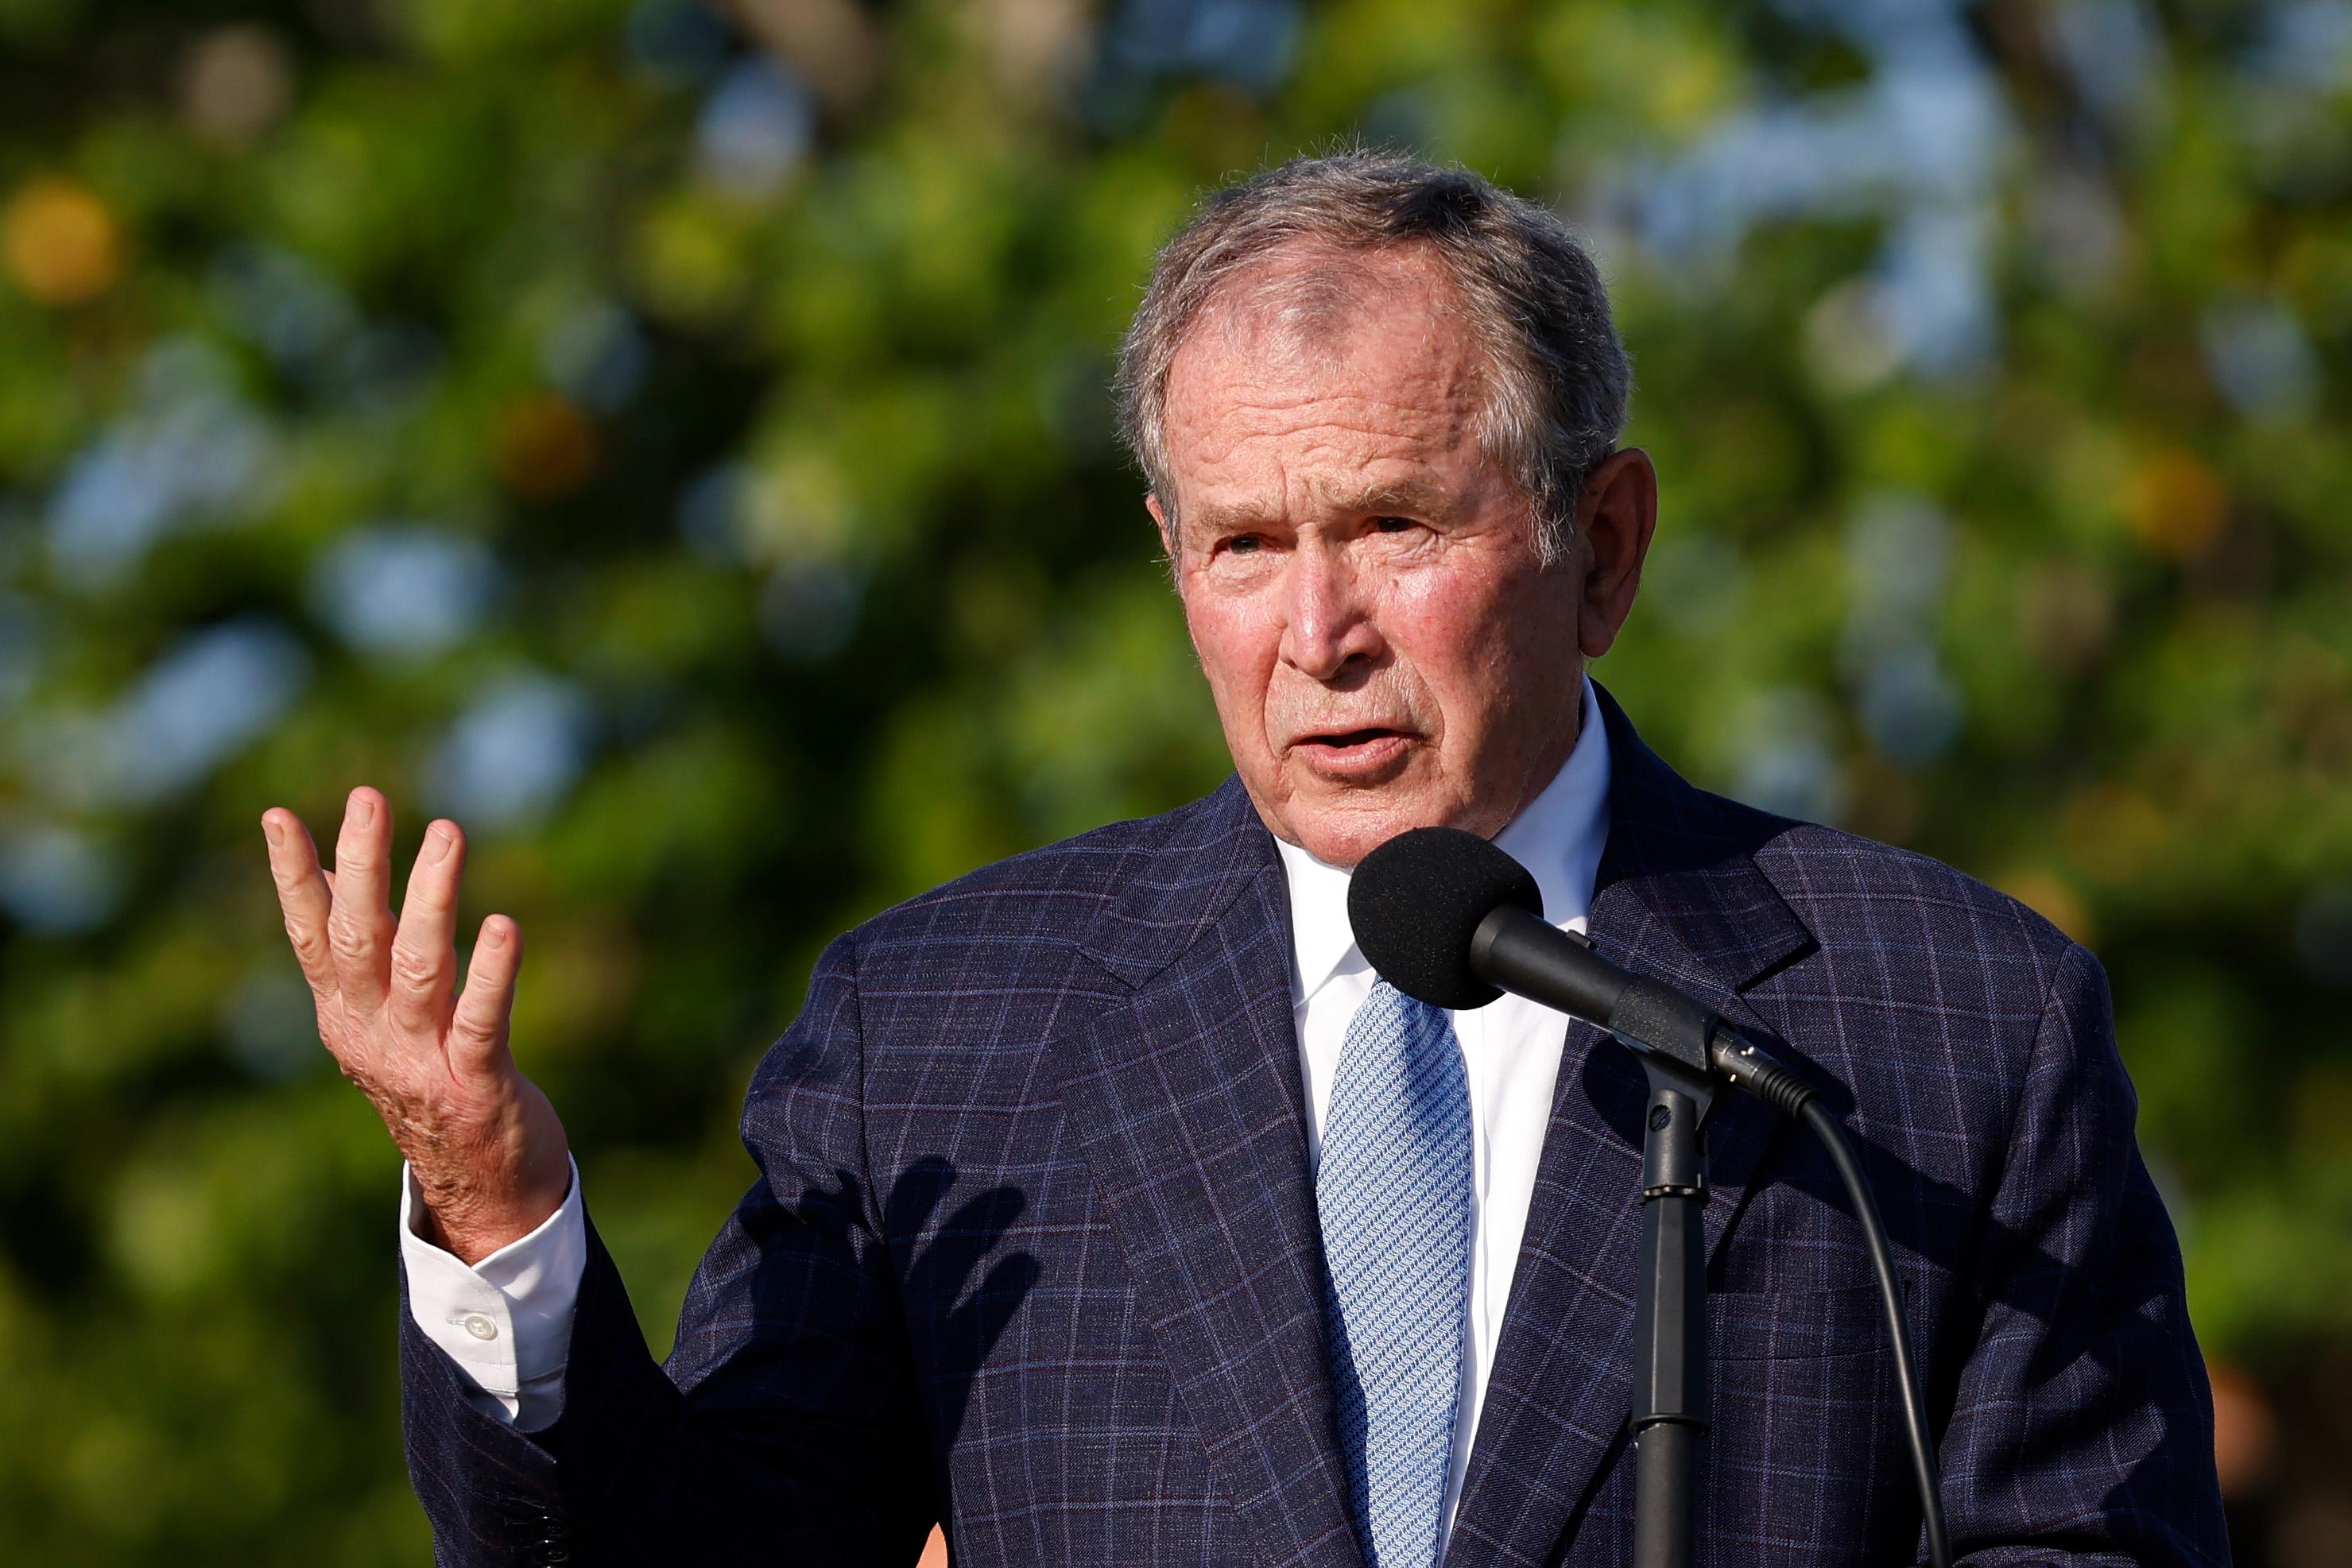 George Bush Delights Democrats, Infuriates MAGA World With Veiled Jan. 6, 9/11  Comparison